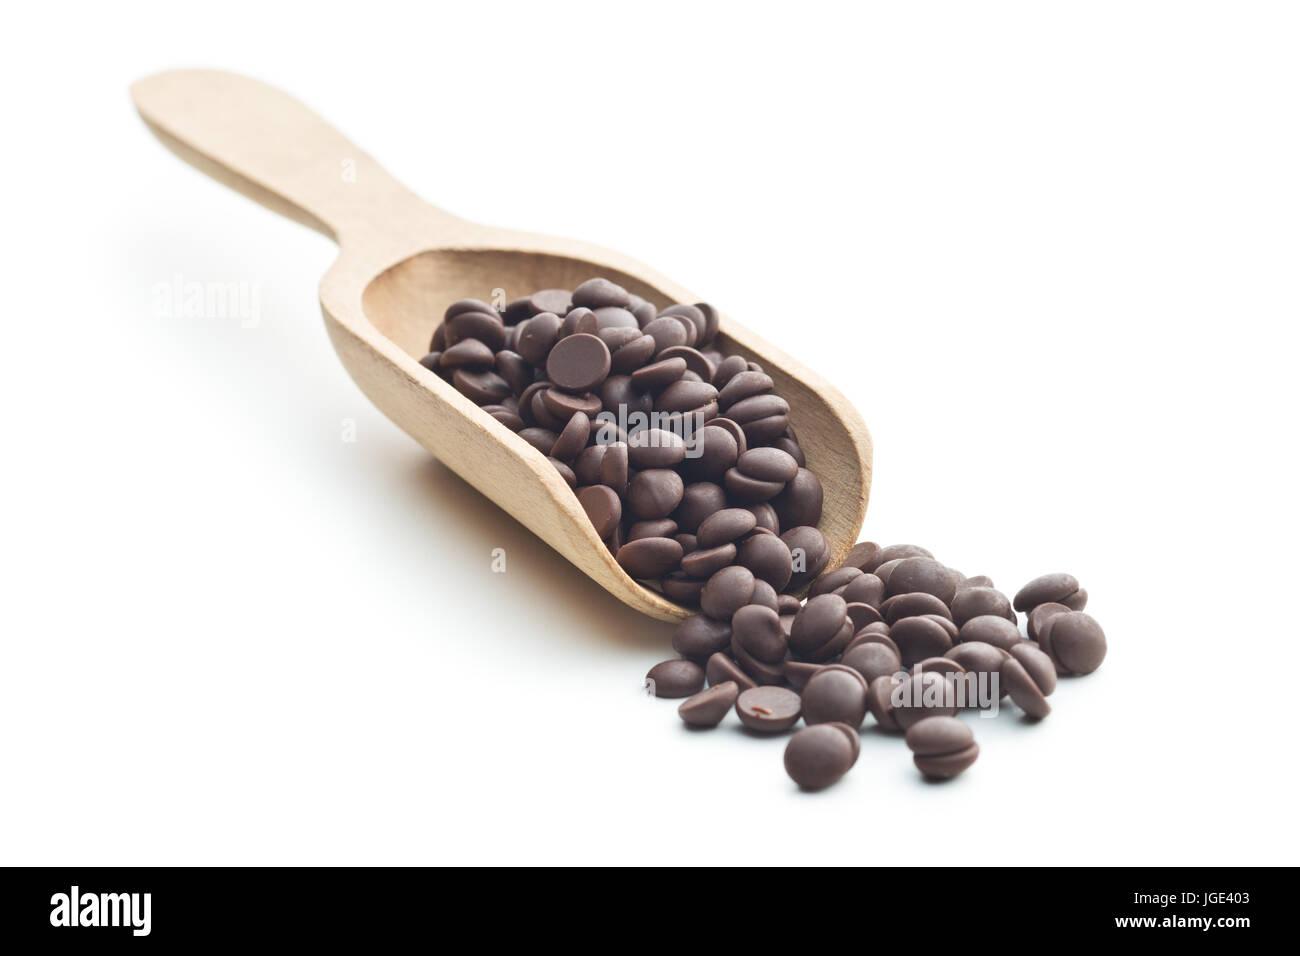 Sabrosos pedacitos de chocolate en boca de madera aislado sobre fondo blanco. Imagen De Stock